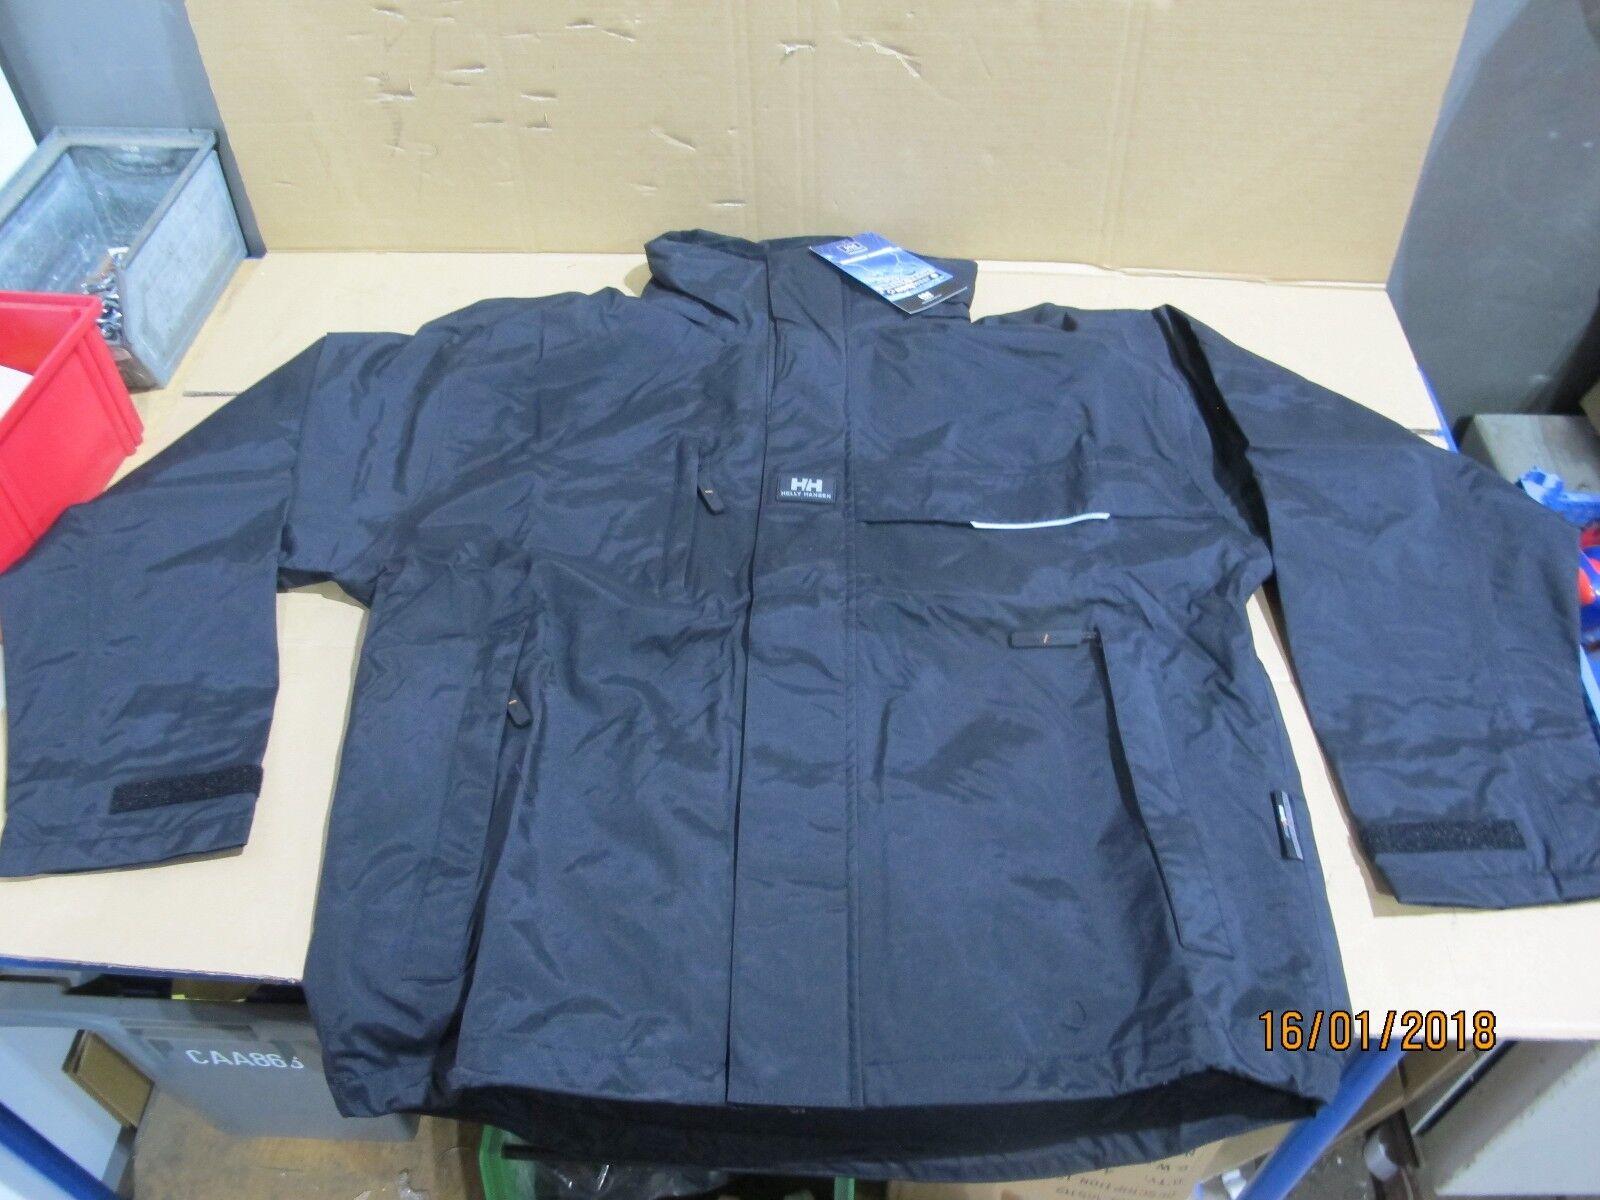 0227  Helly Hansen Regenjacke Regenjacke Regenjacke Regenbekleidung Schwarz 8dcb21